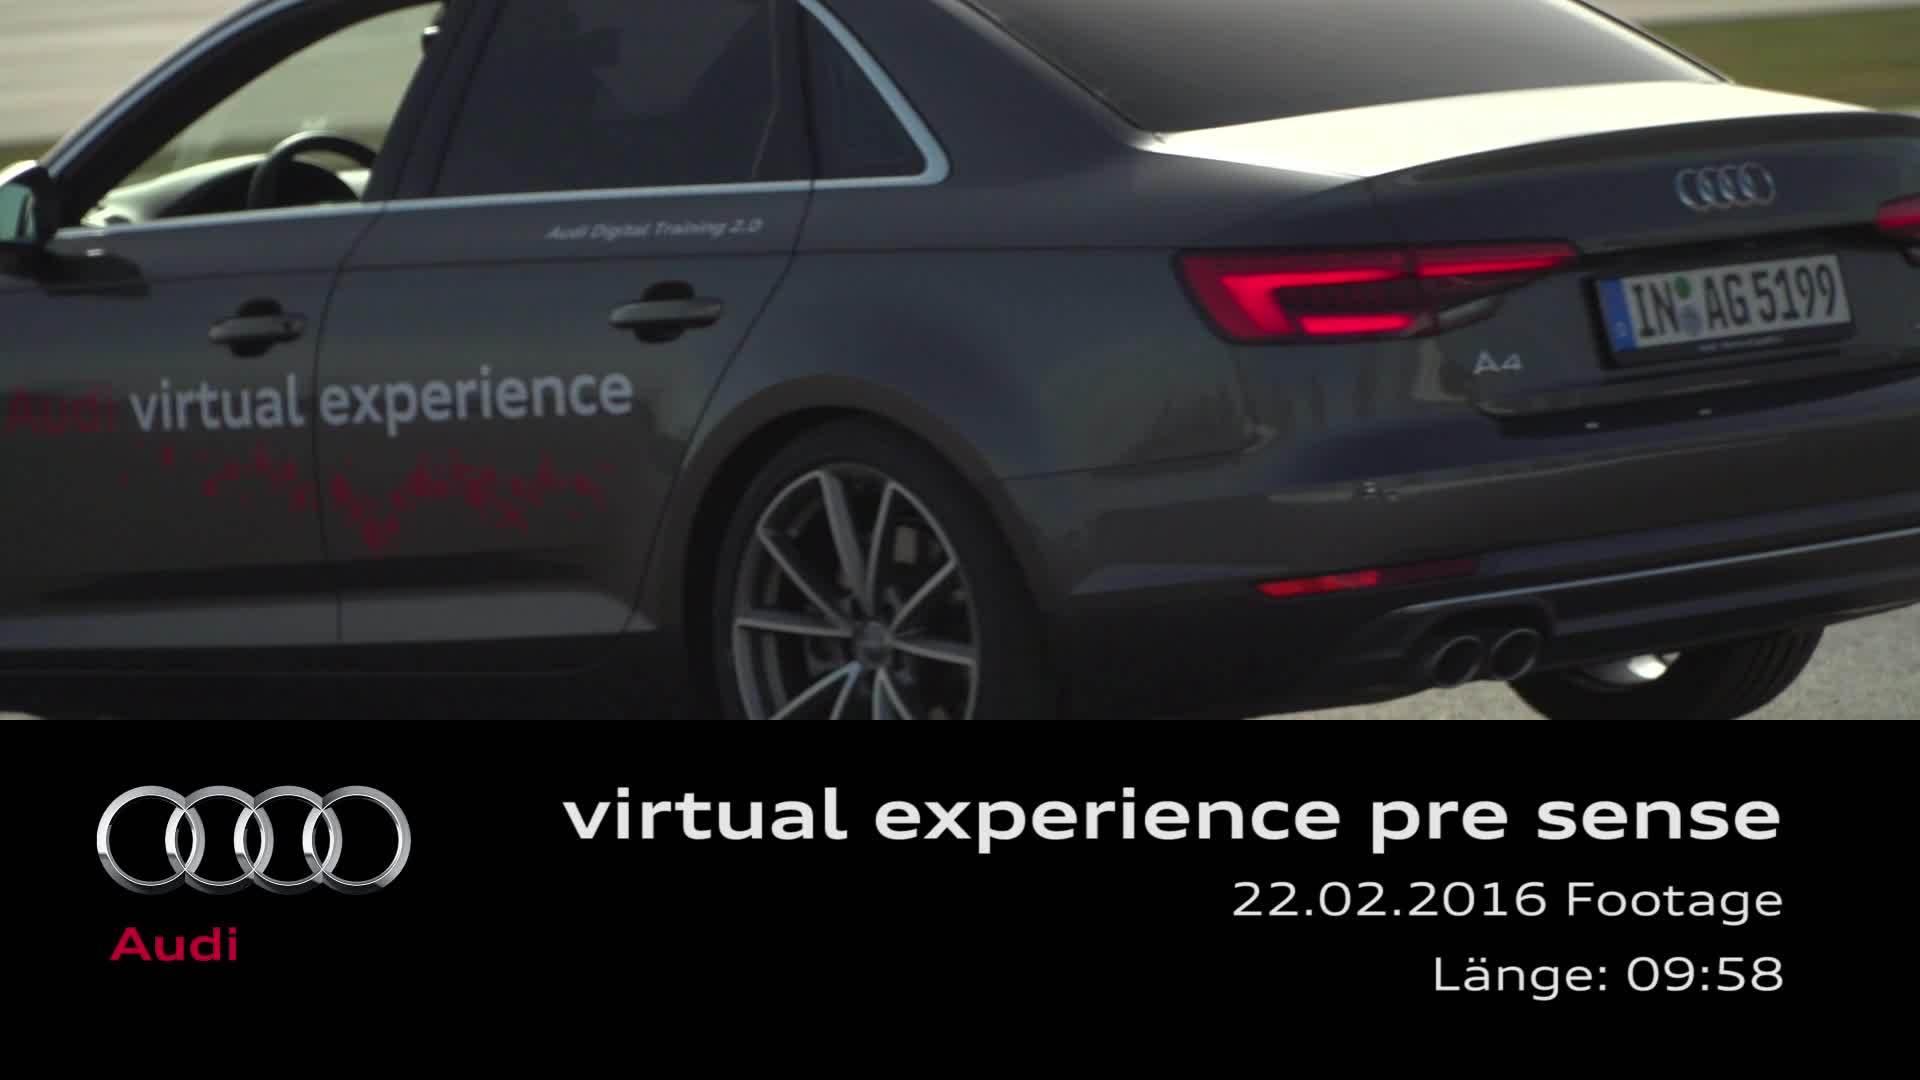 Virtual Experience pre sense Footage